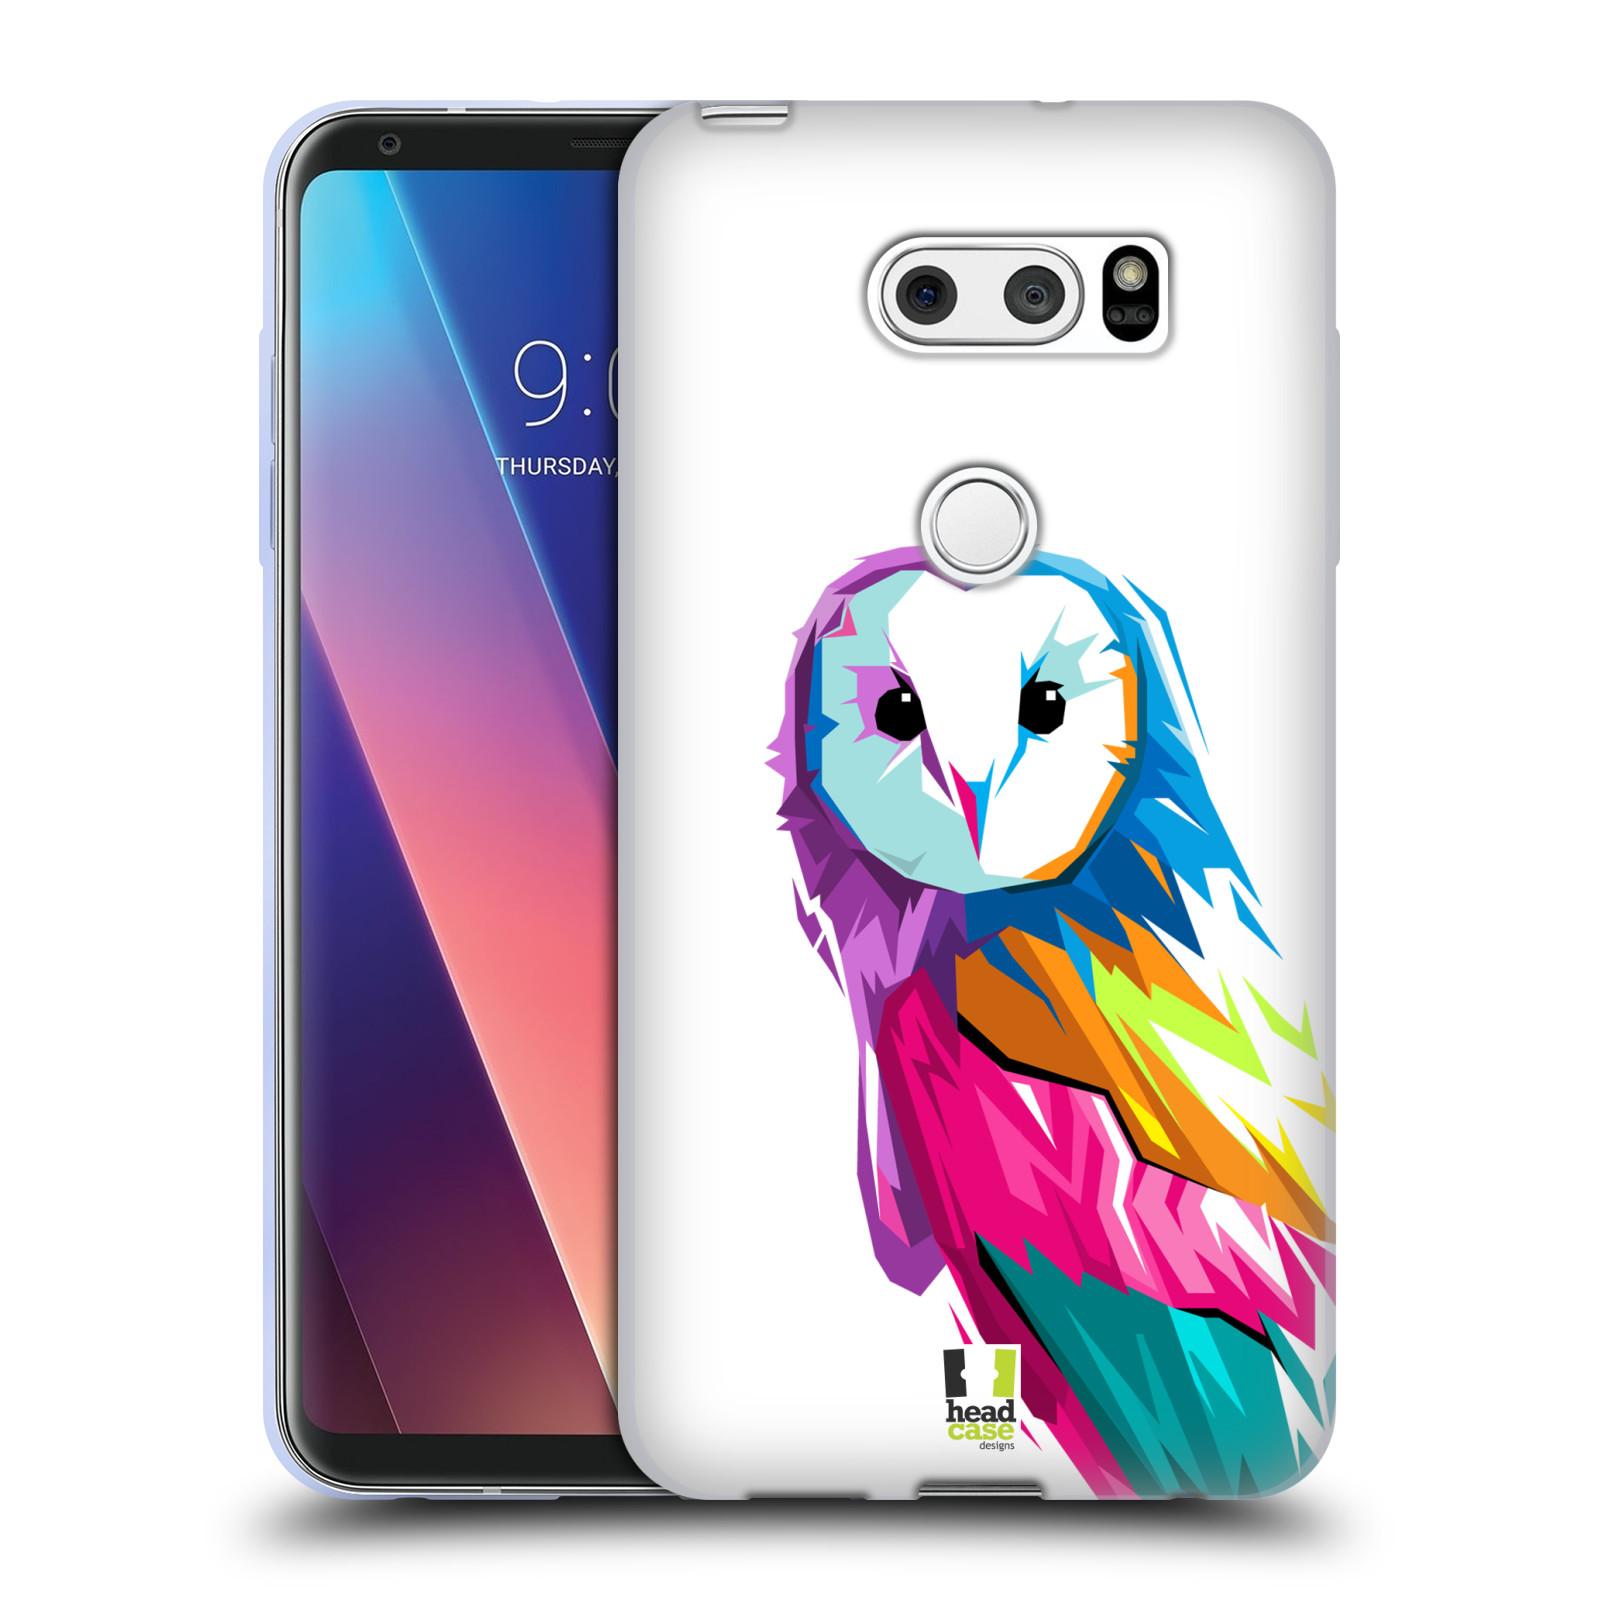 HEAD CASE silikonový obal na mobil LG V30 / V30 PLUS vzor POP ART kubismus SOVA